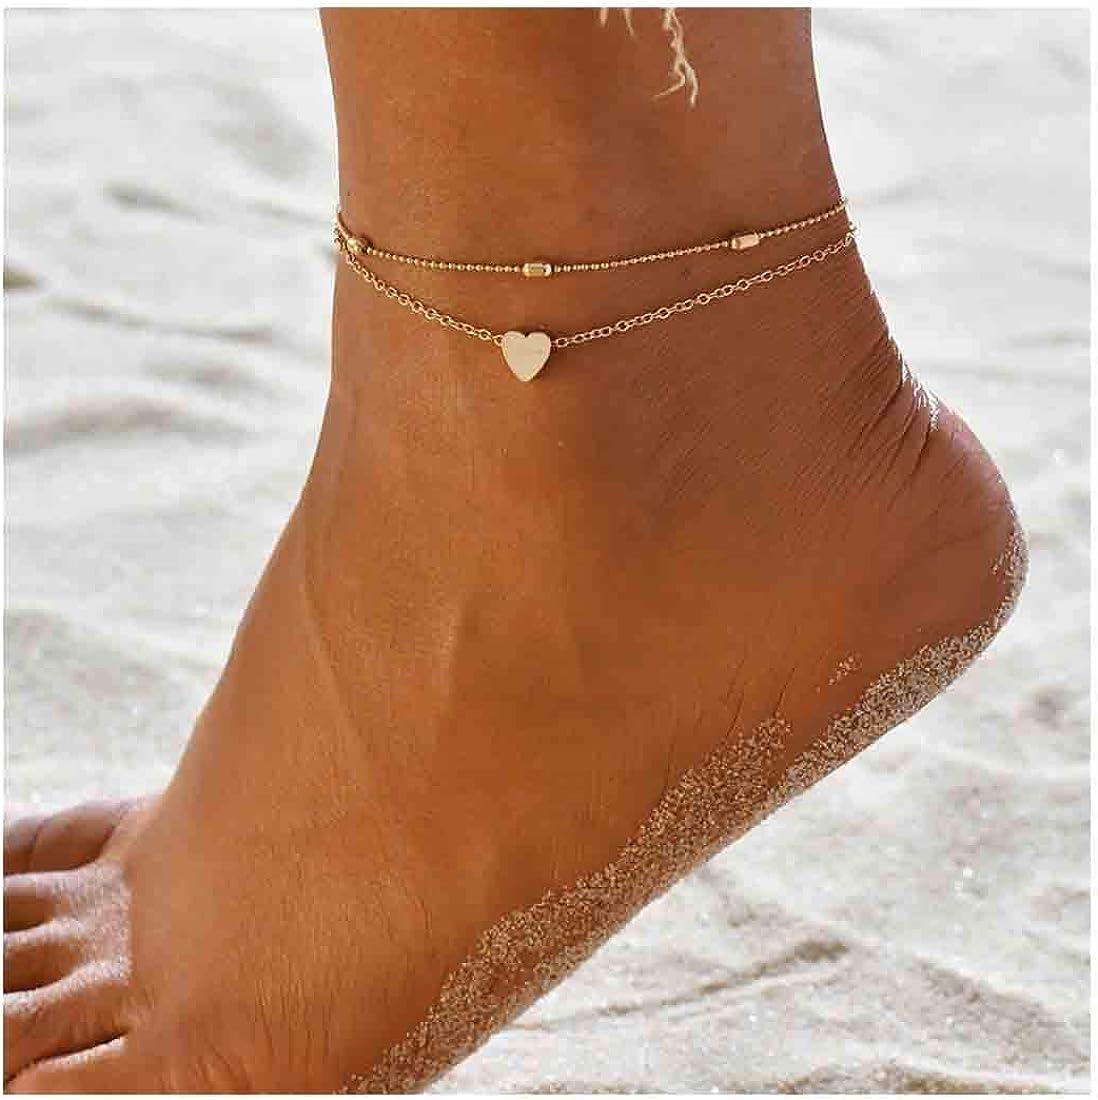 Yfe Tiny Heart Anklet...